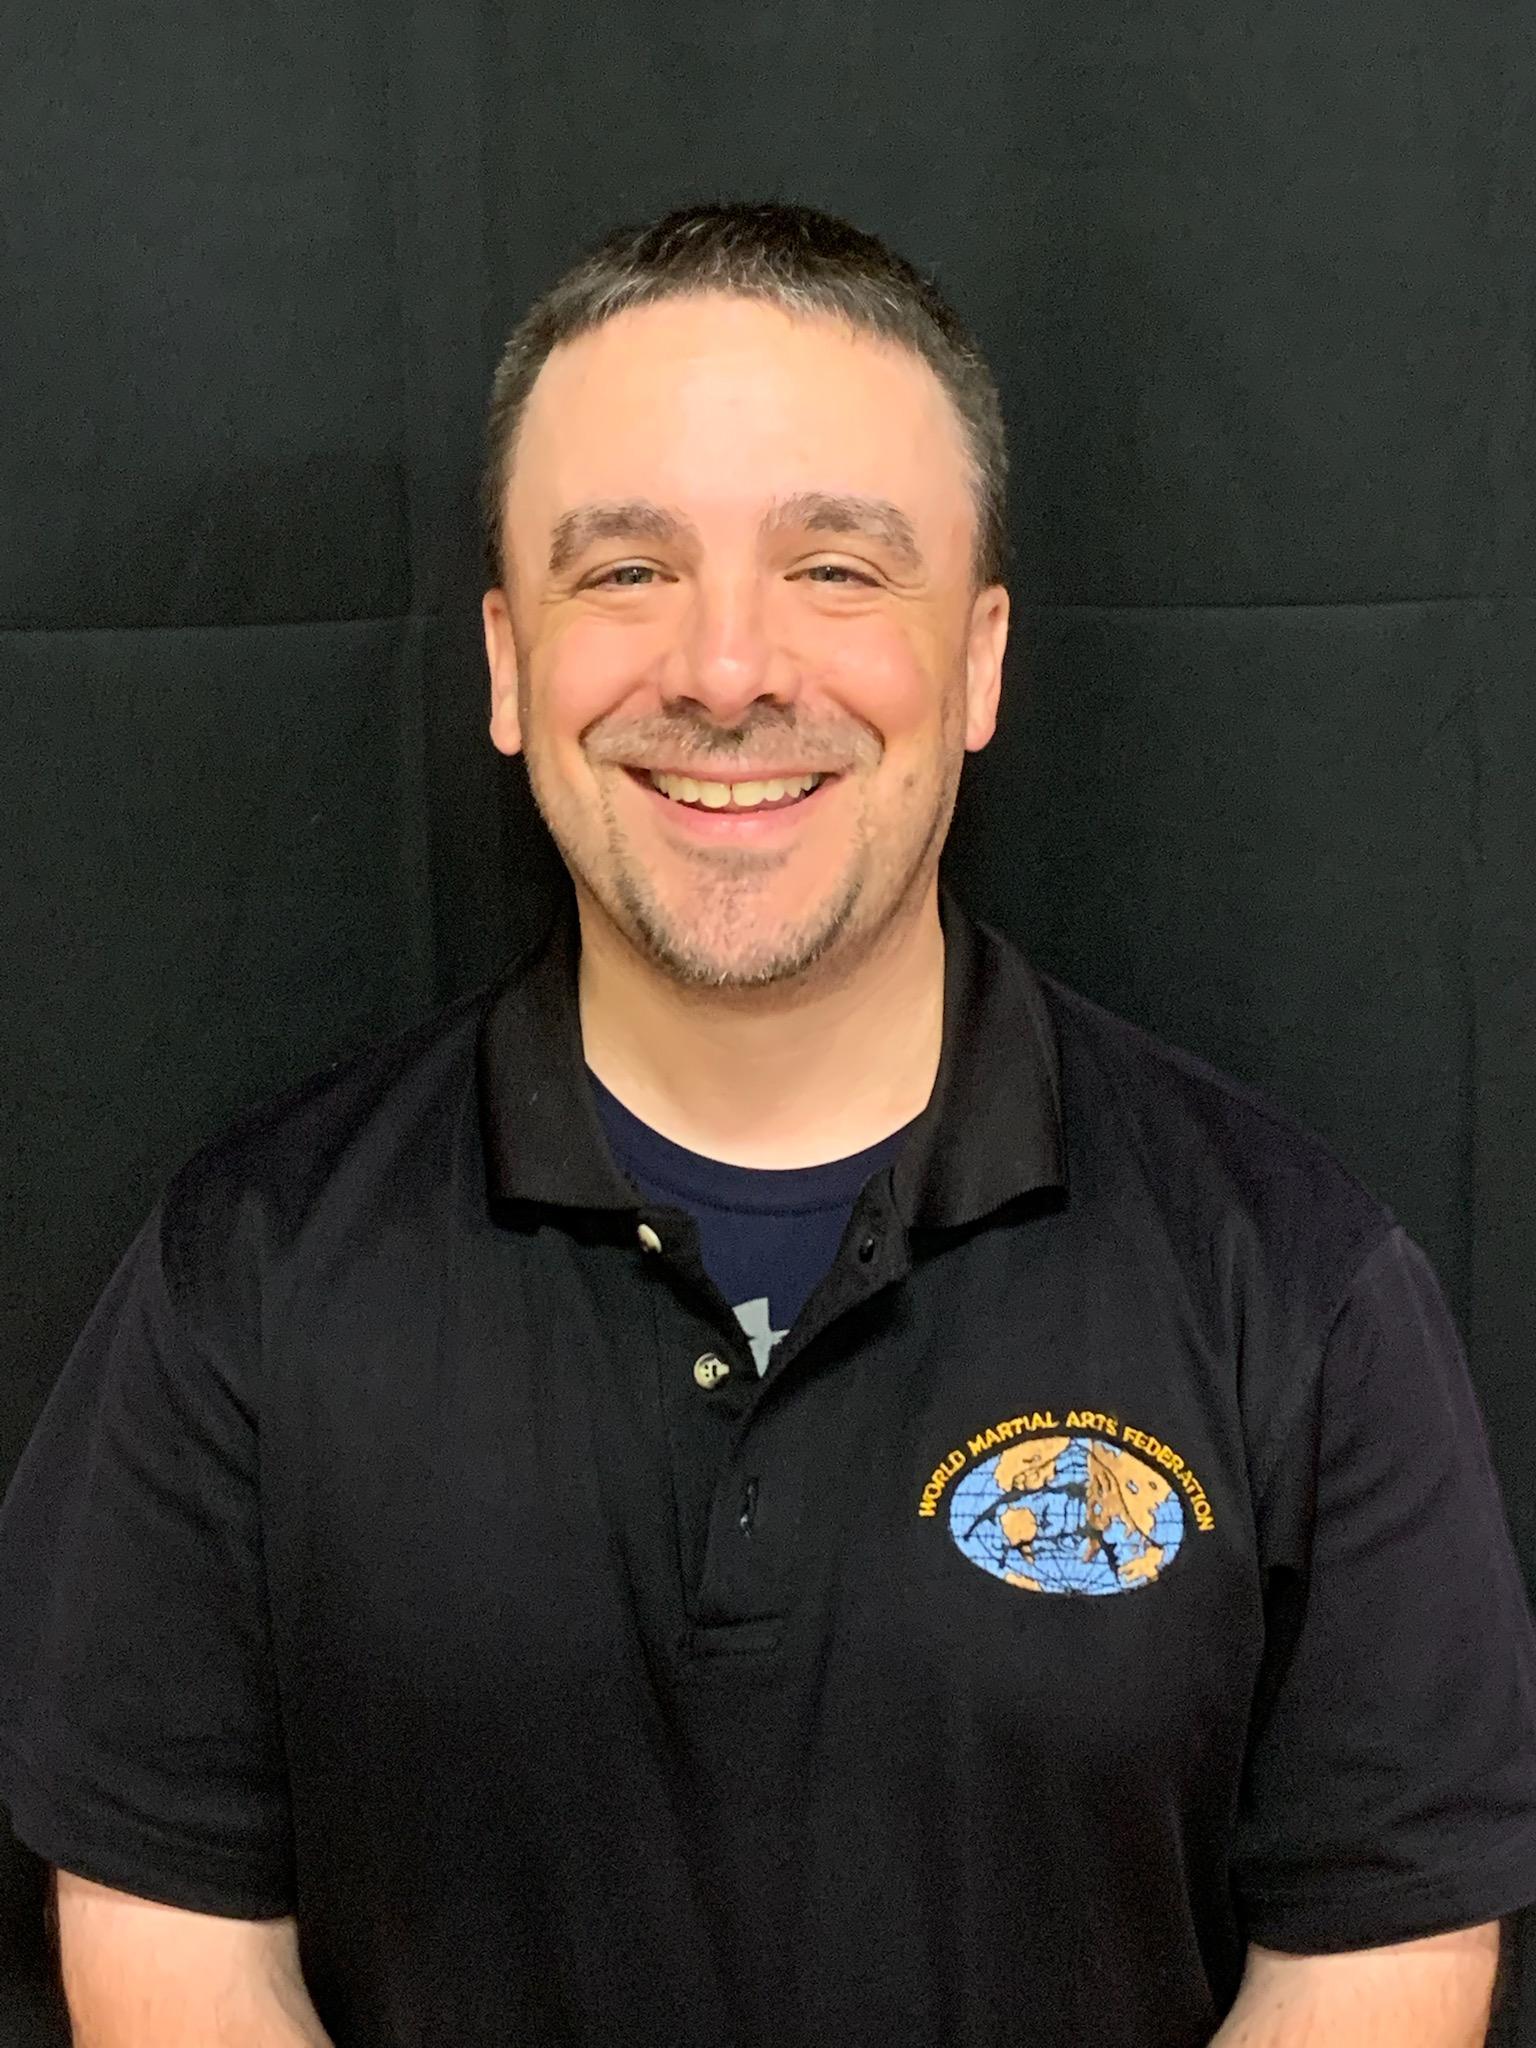 Chuck Leverone - Instructor